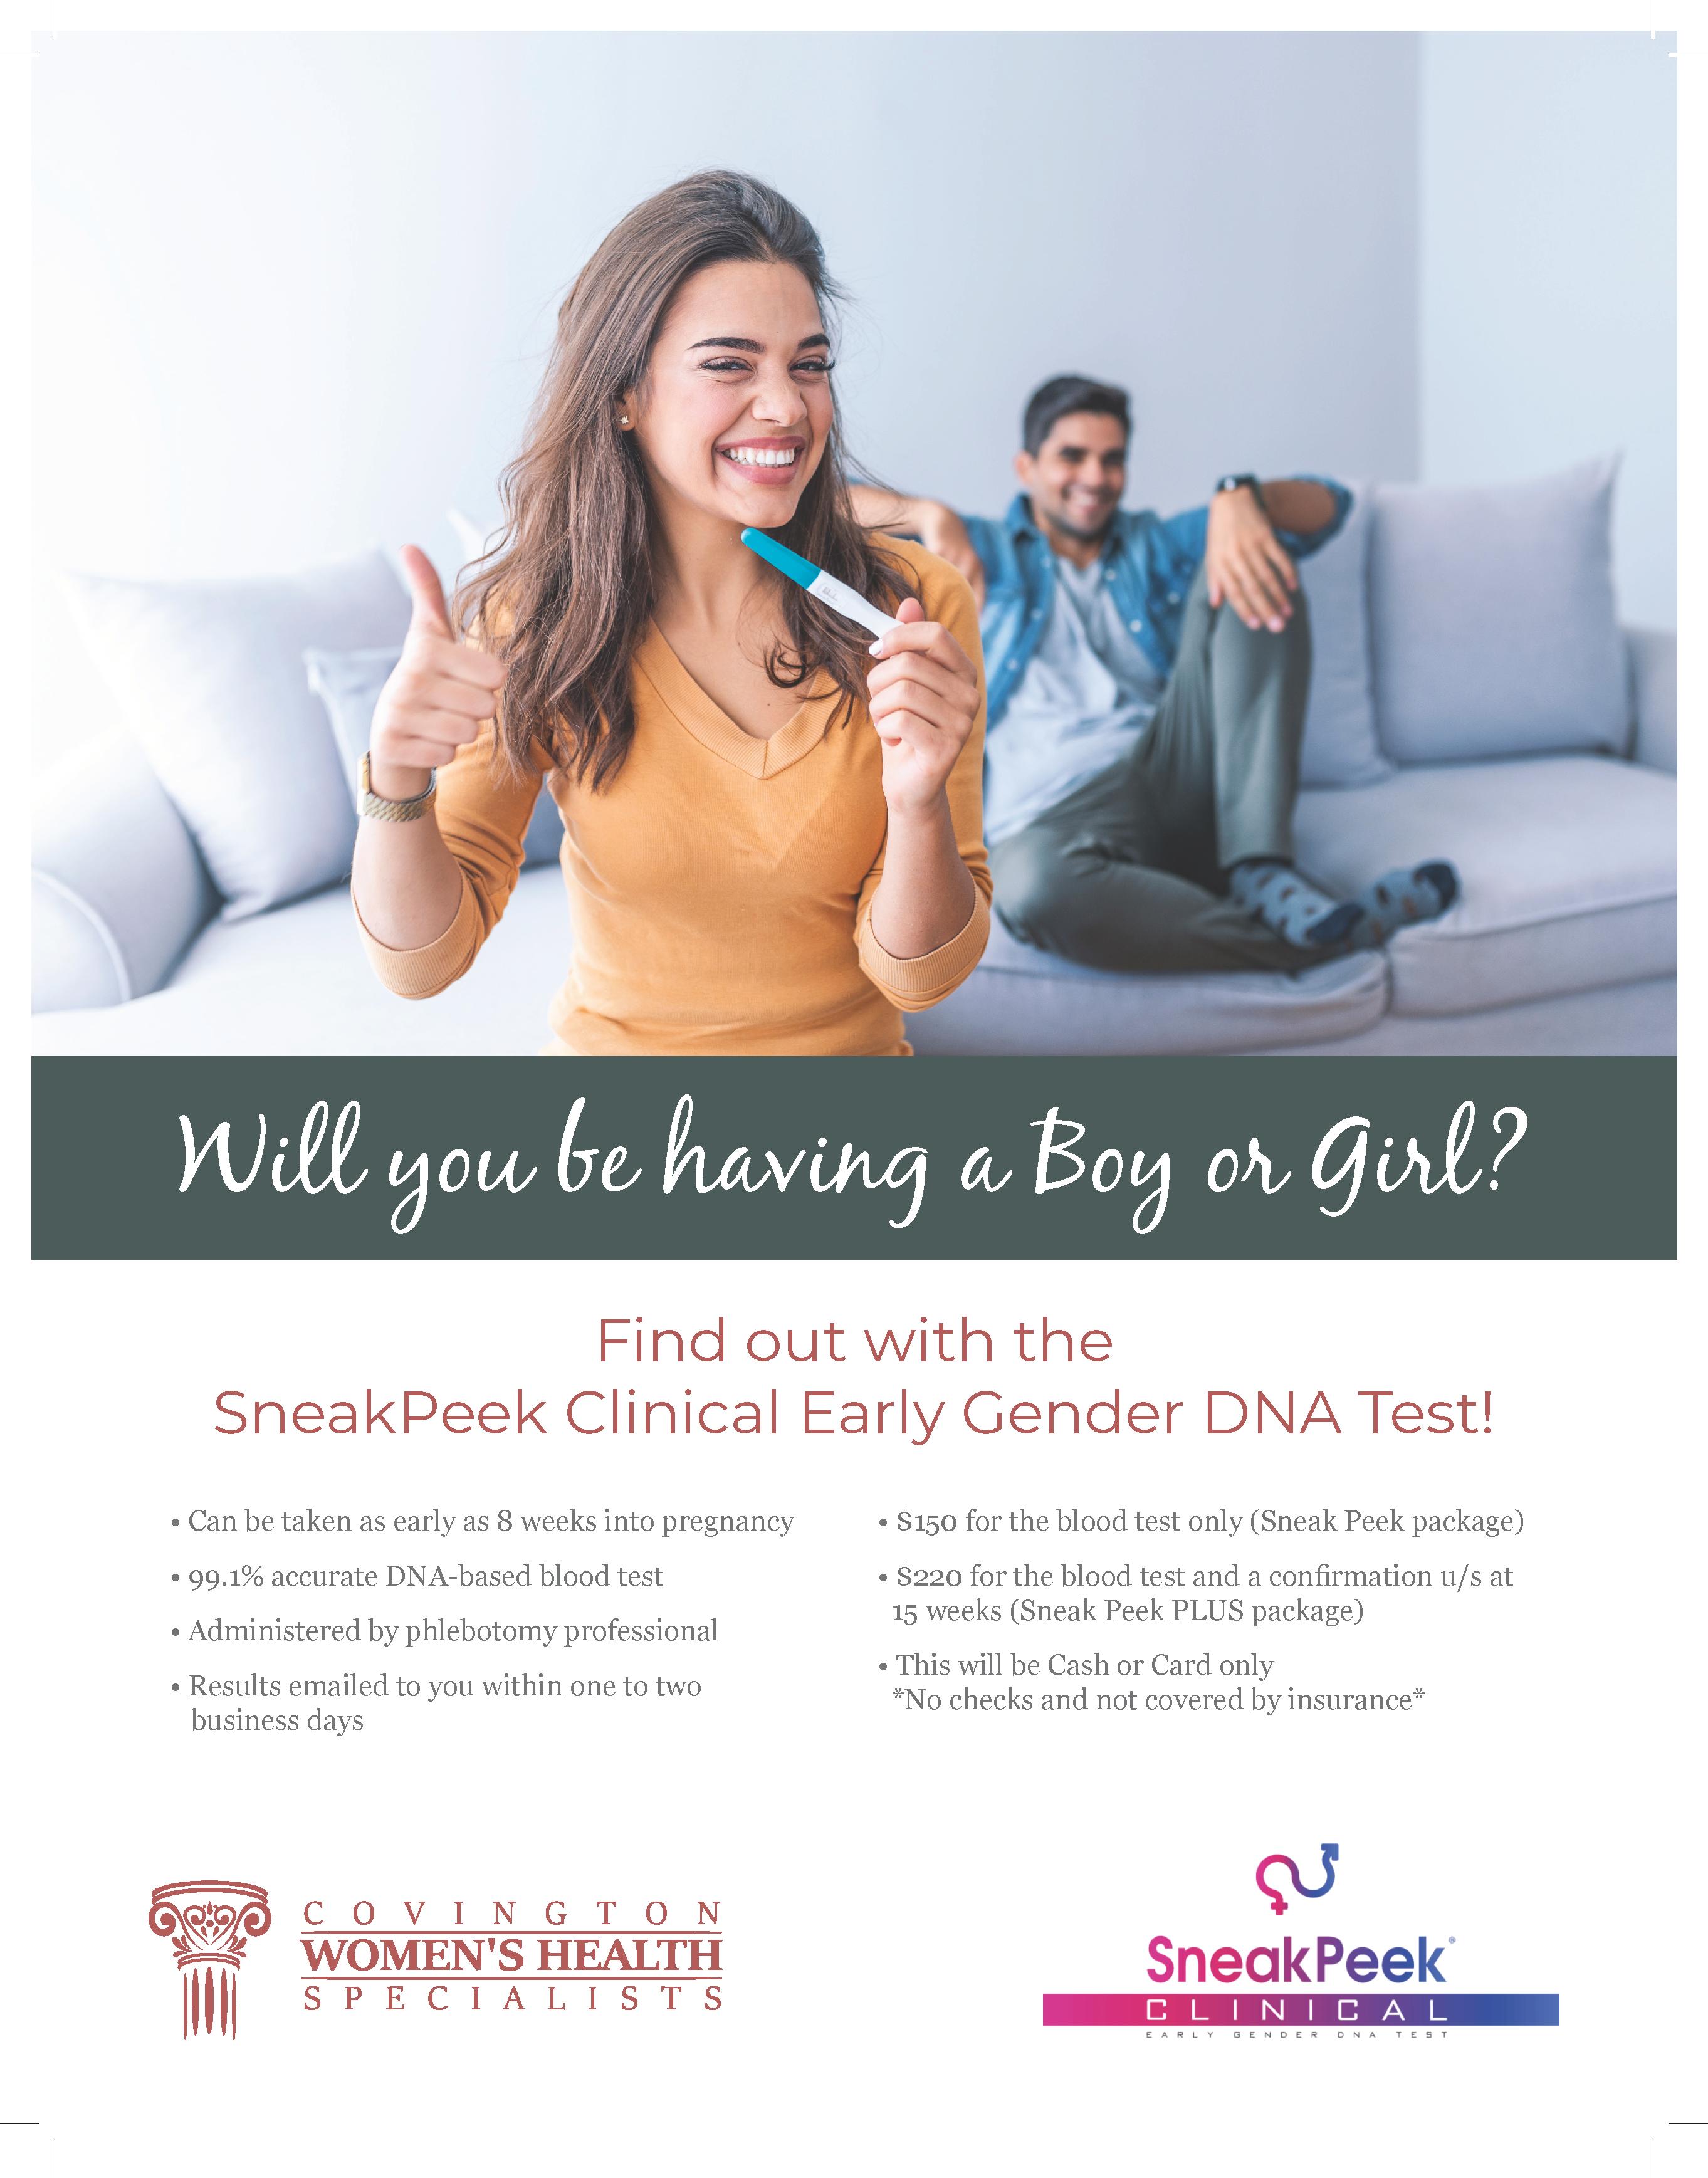 Flyer five of Covington Women's Health gender reveal service.